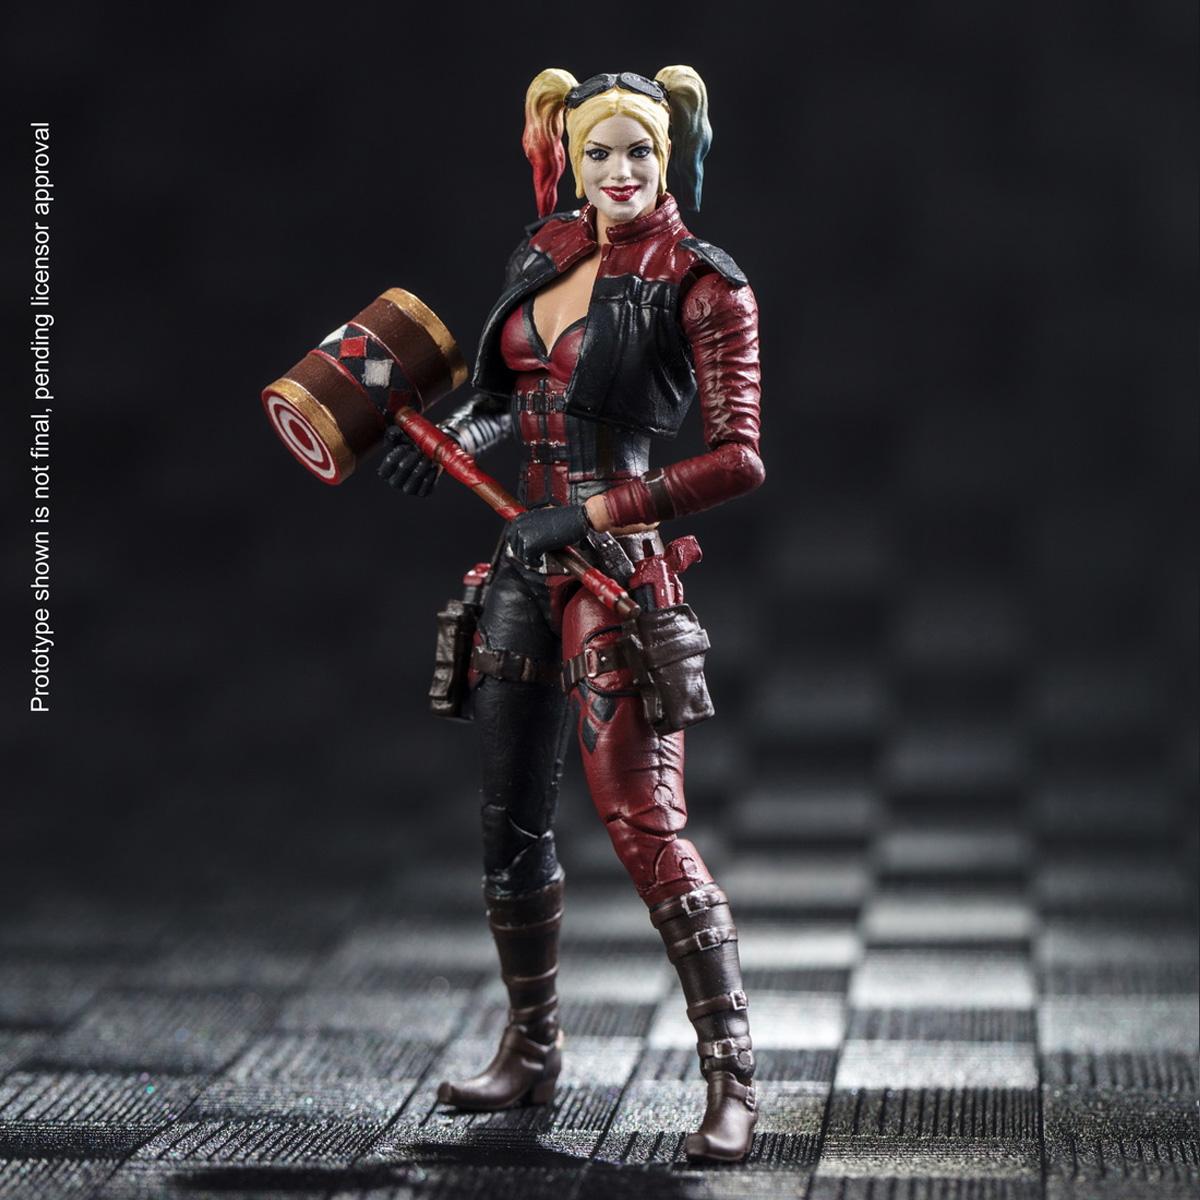 Hiyatoys 1 18th Harley Quinn Injustice 2 Female Action